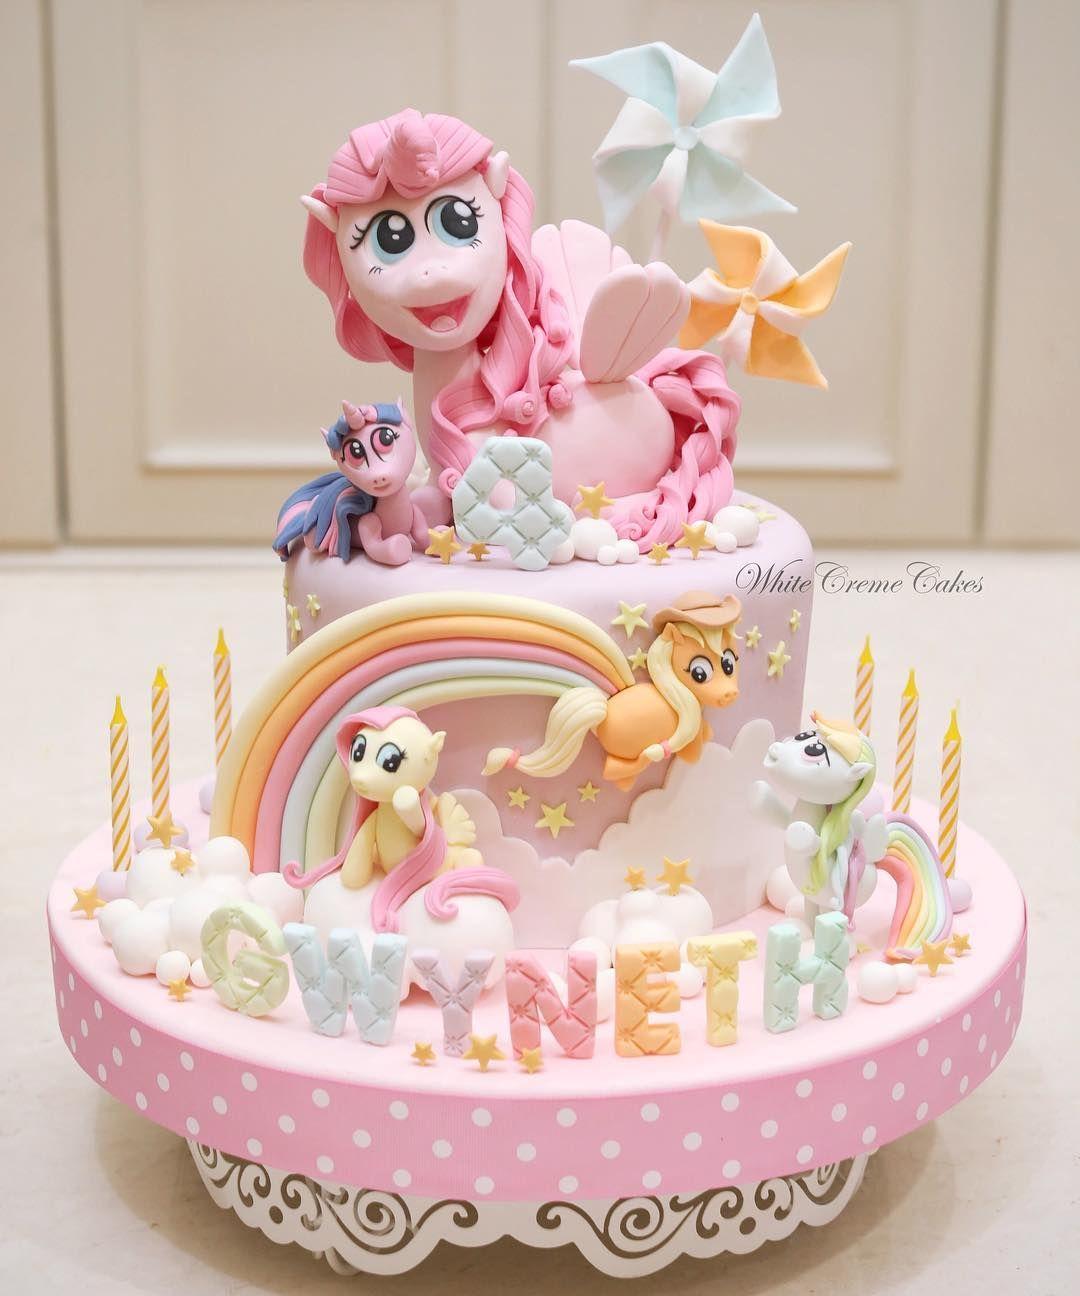 Kue Ultah Kuda Poni : ultah, Little, Gwyneth🦄, #mylittleponycake, #customize, #handmade, #3dcake, #icing, #fondant, #cake, #cakes, Ulang, Tahun,